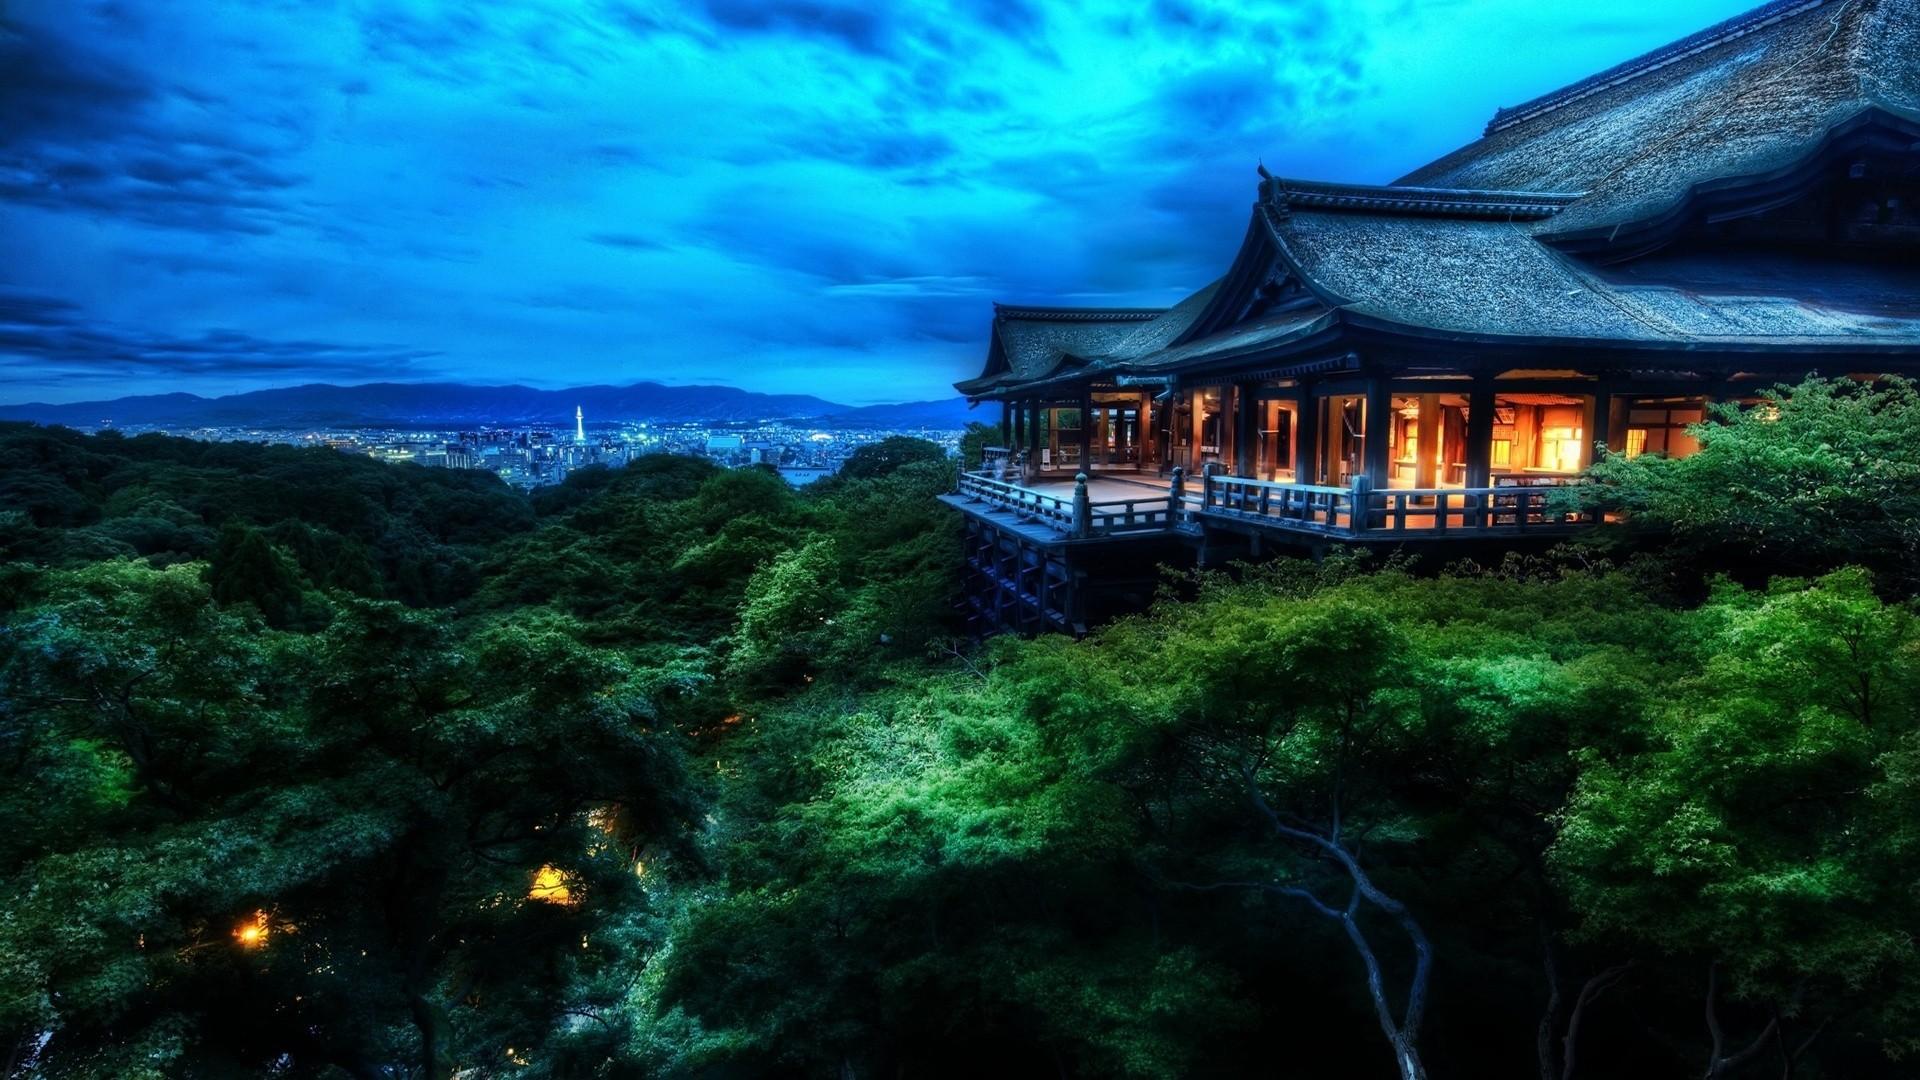 Res: 1920x1080, Japan Night Landscape Wallpaper HD Wallpaper